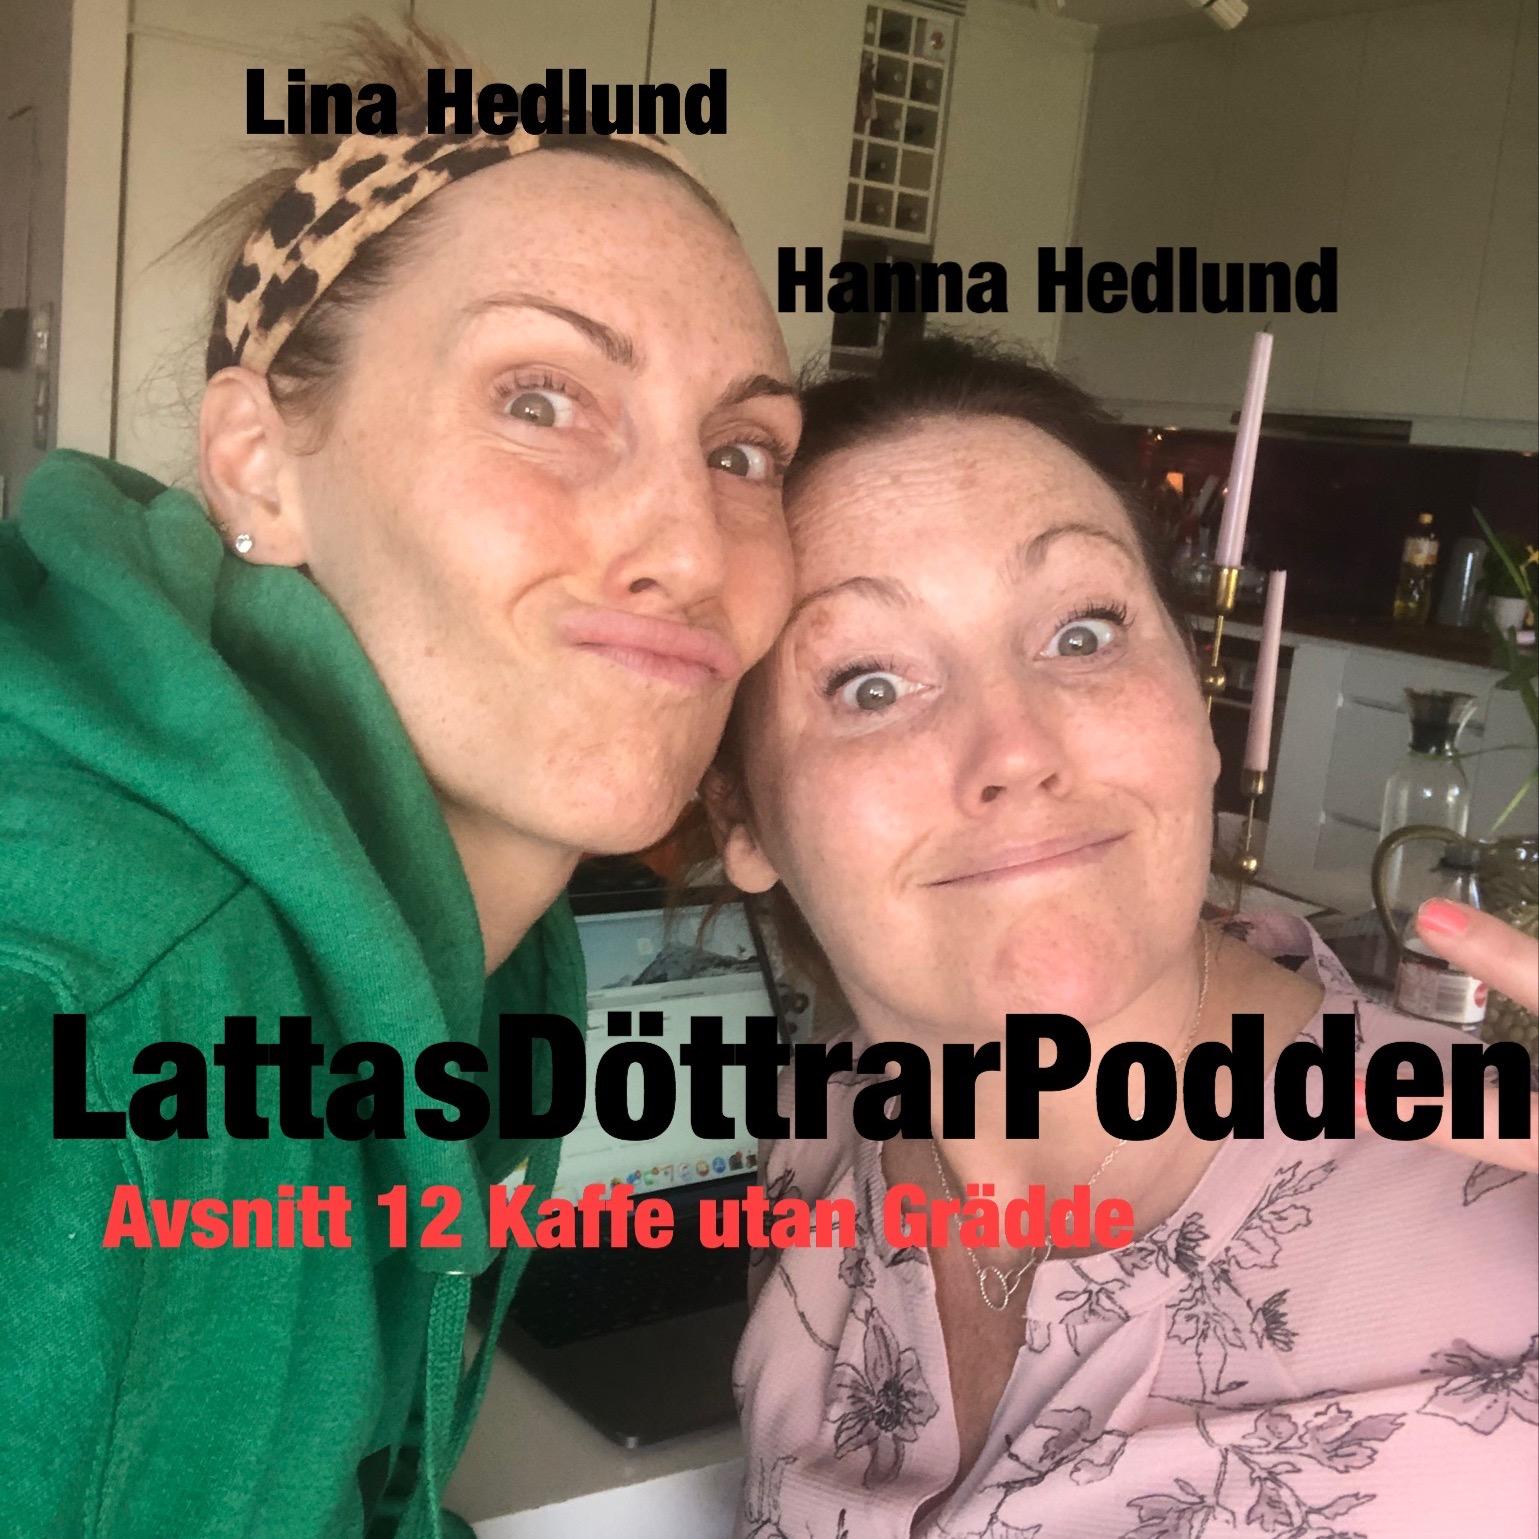 LattasDöttrarPodden